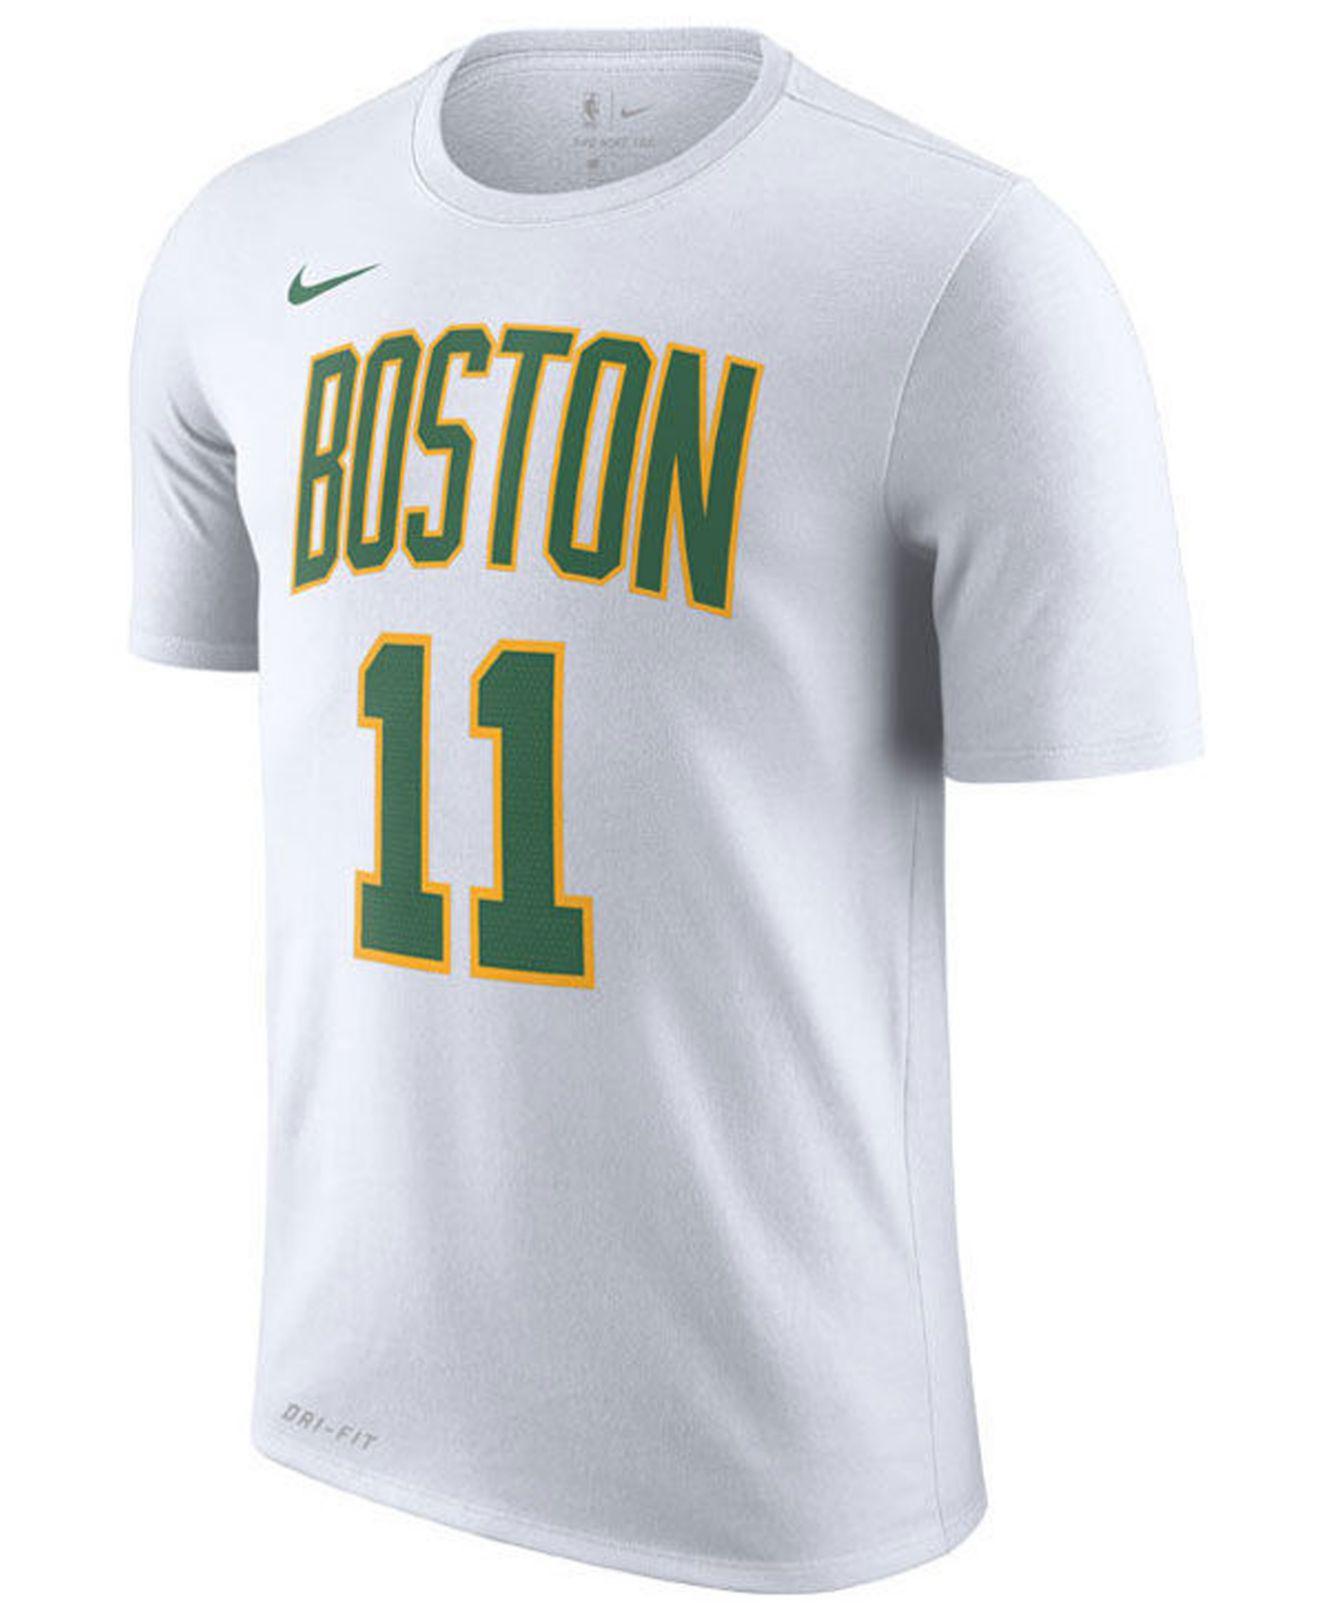 online store 11410 fa641 Men's White Kyrie Irving Boston Celtics City Player T-shirt 2018